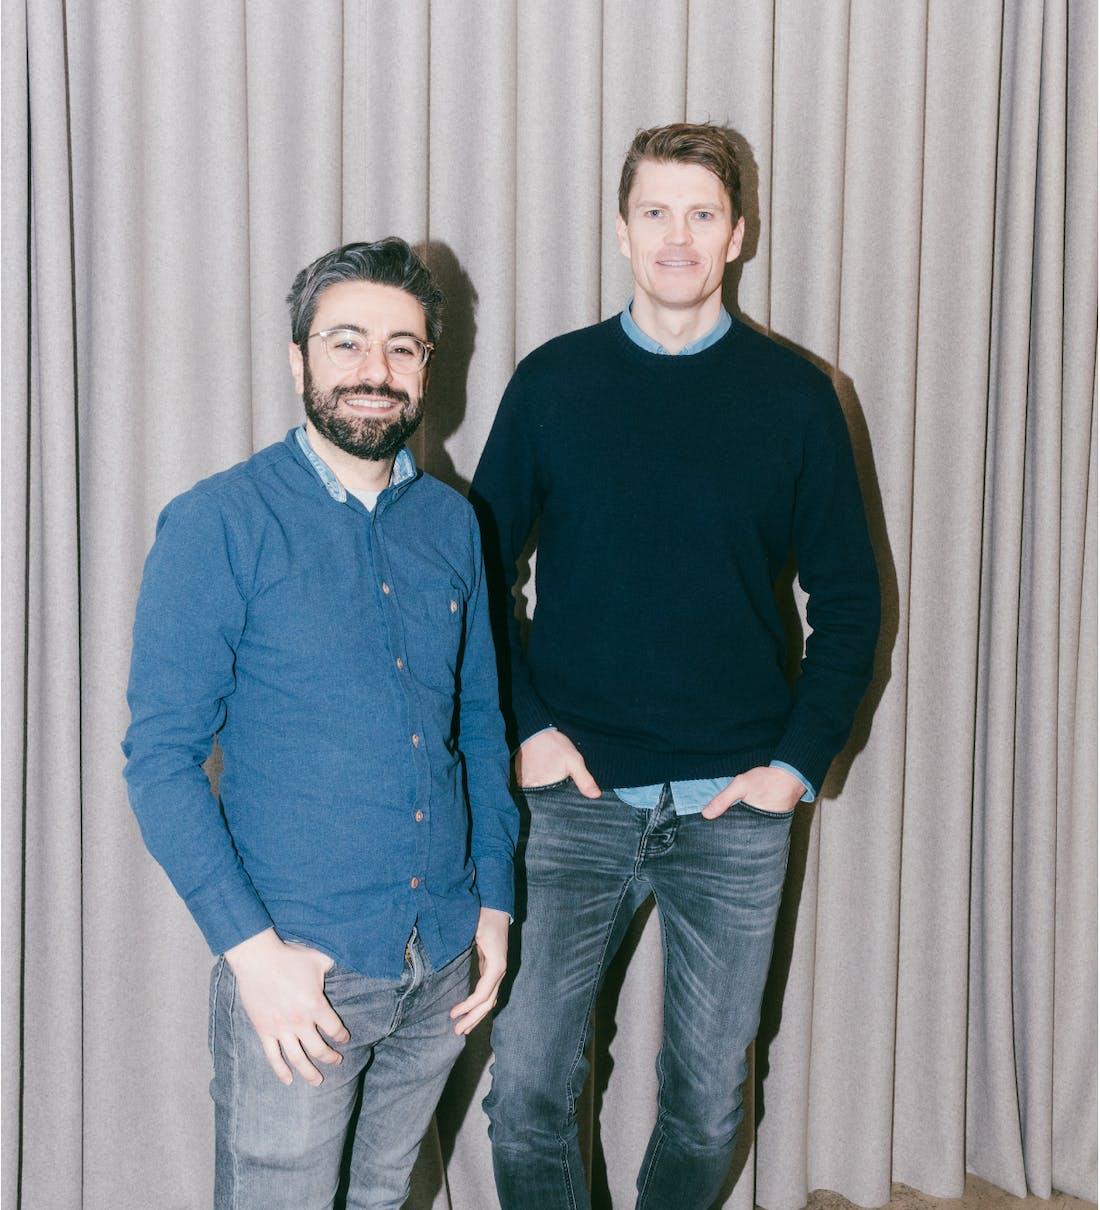 The founders of Pleo